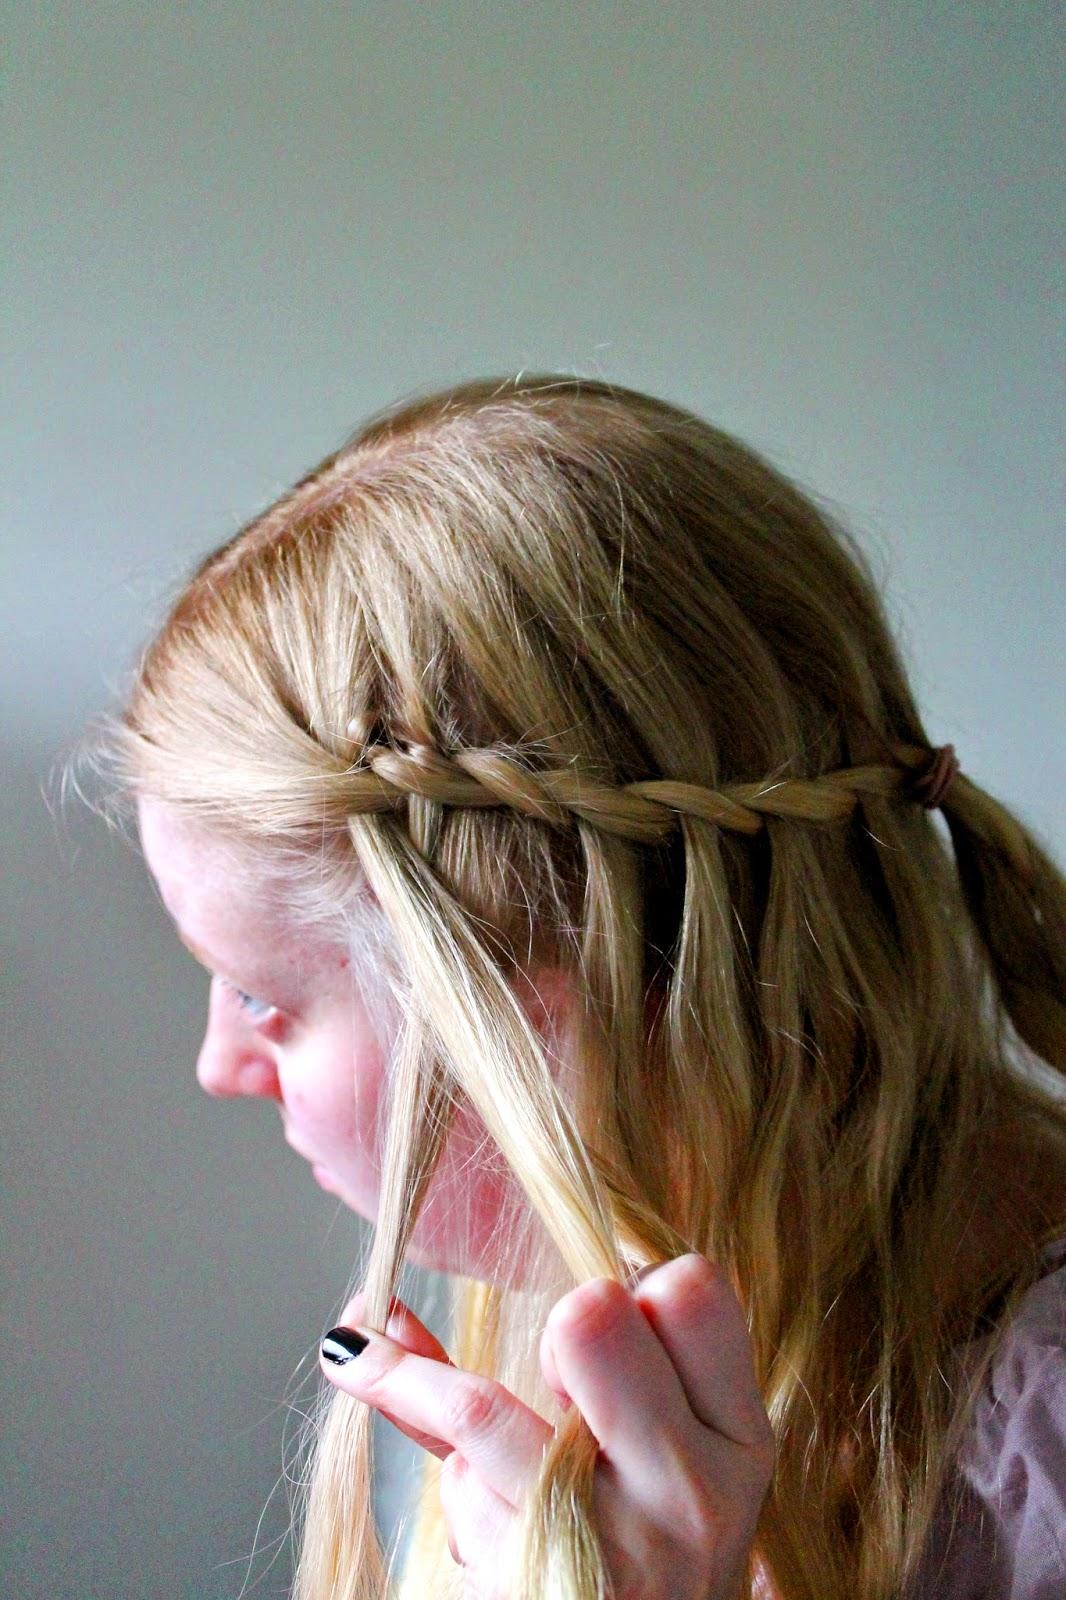 Game of thrones double waterfall braid how to | Alinan kotona blog